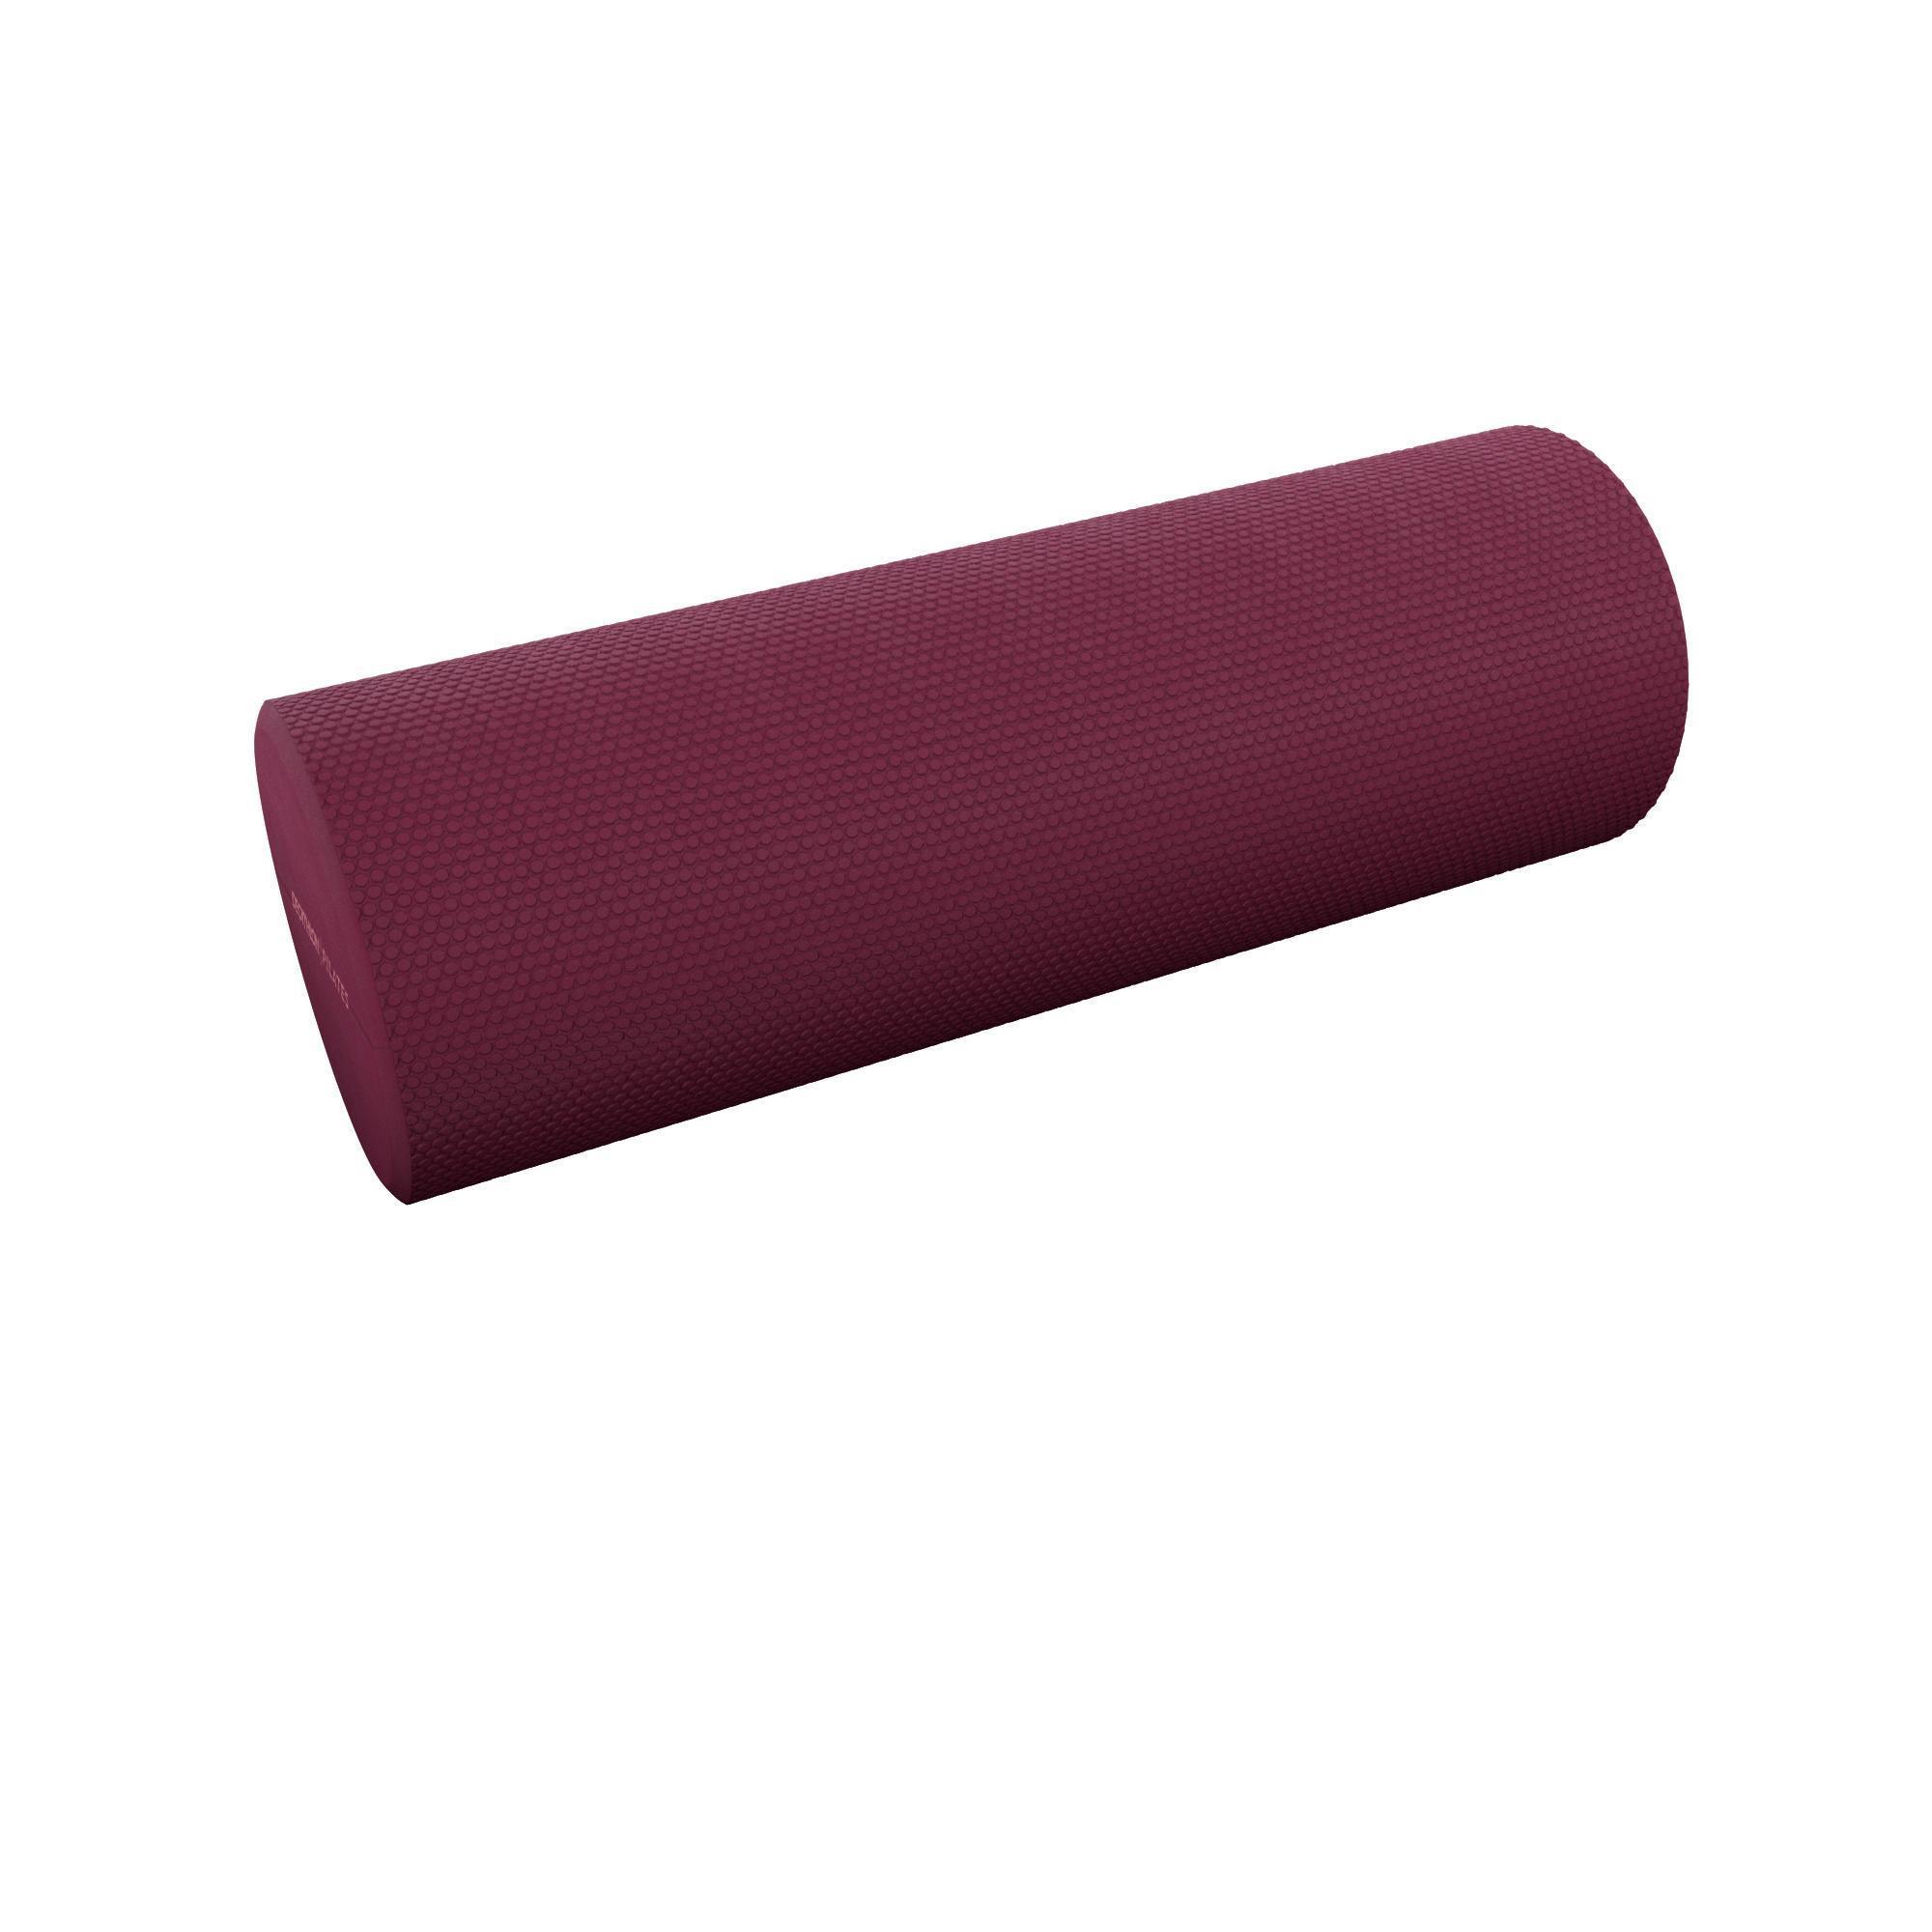 nyamba rullo pilates mini foam roller bordeaux 38cm